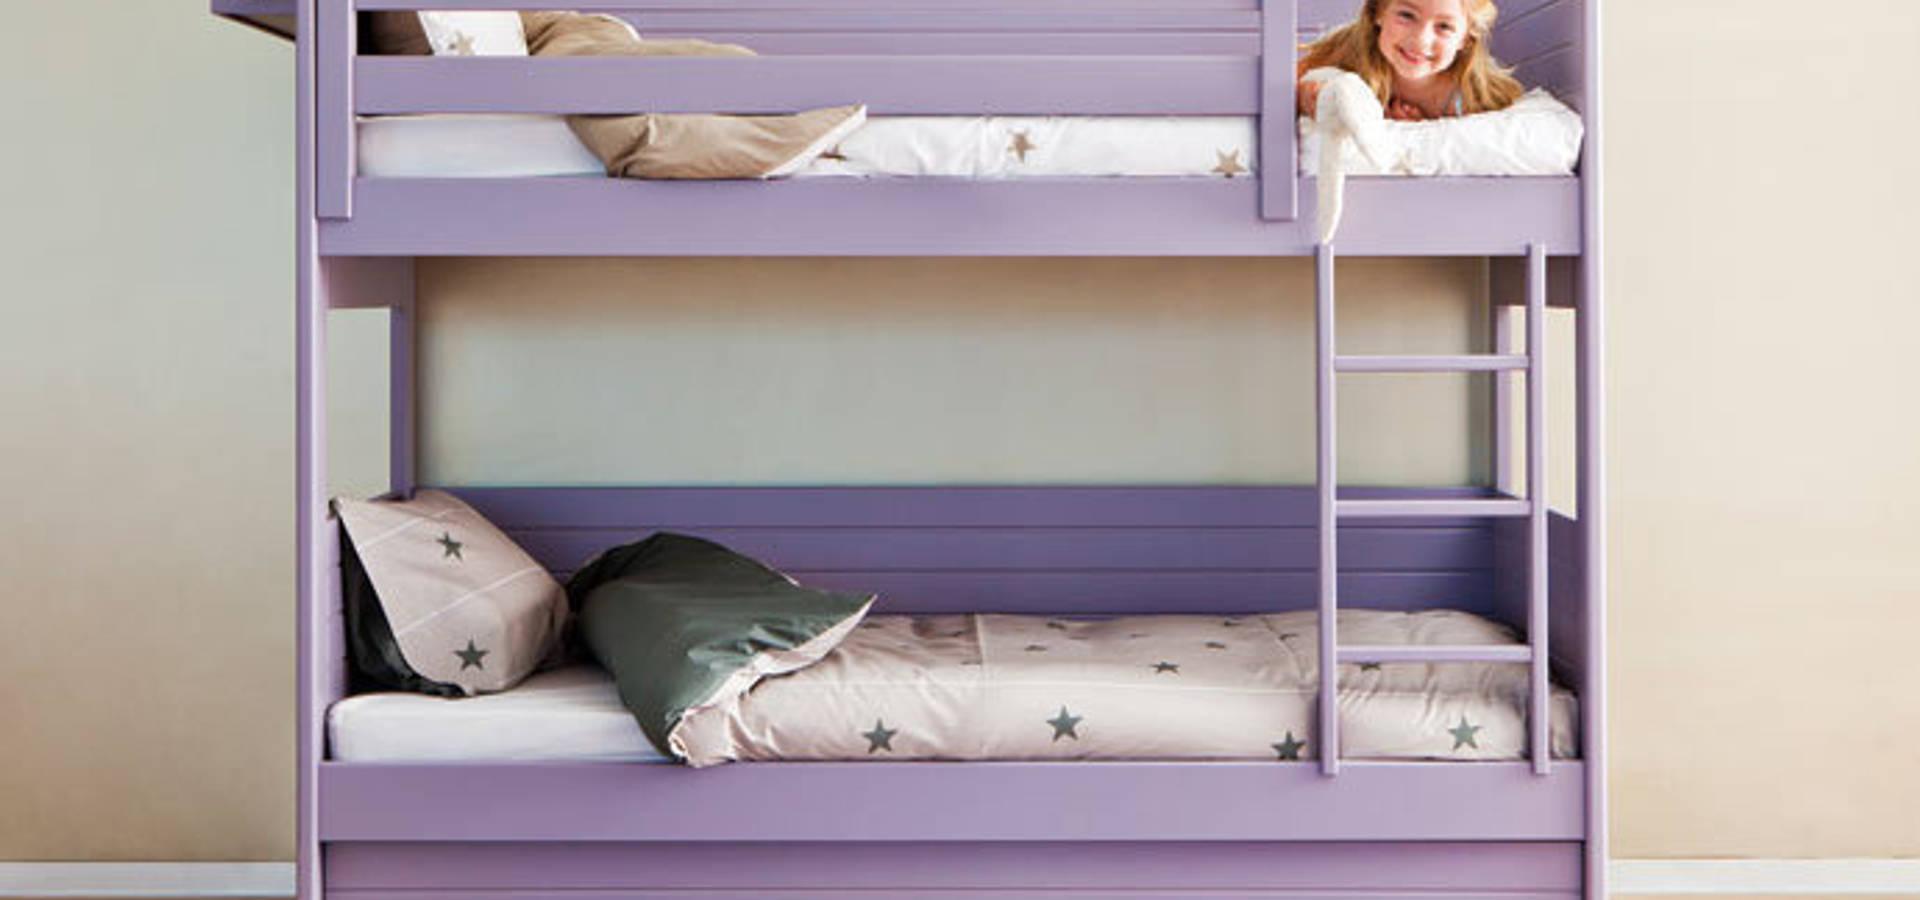 Mobiliario juvenil par sof s camas cruces homify - Sofas camas cruces ...